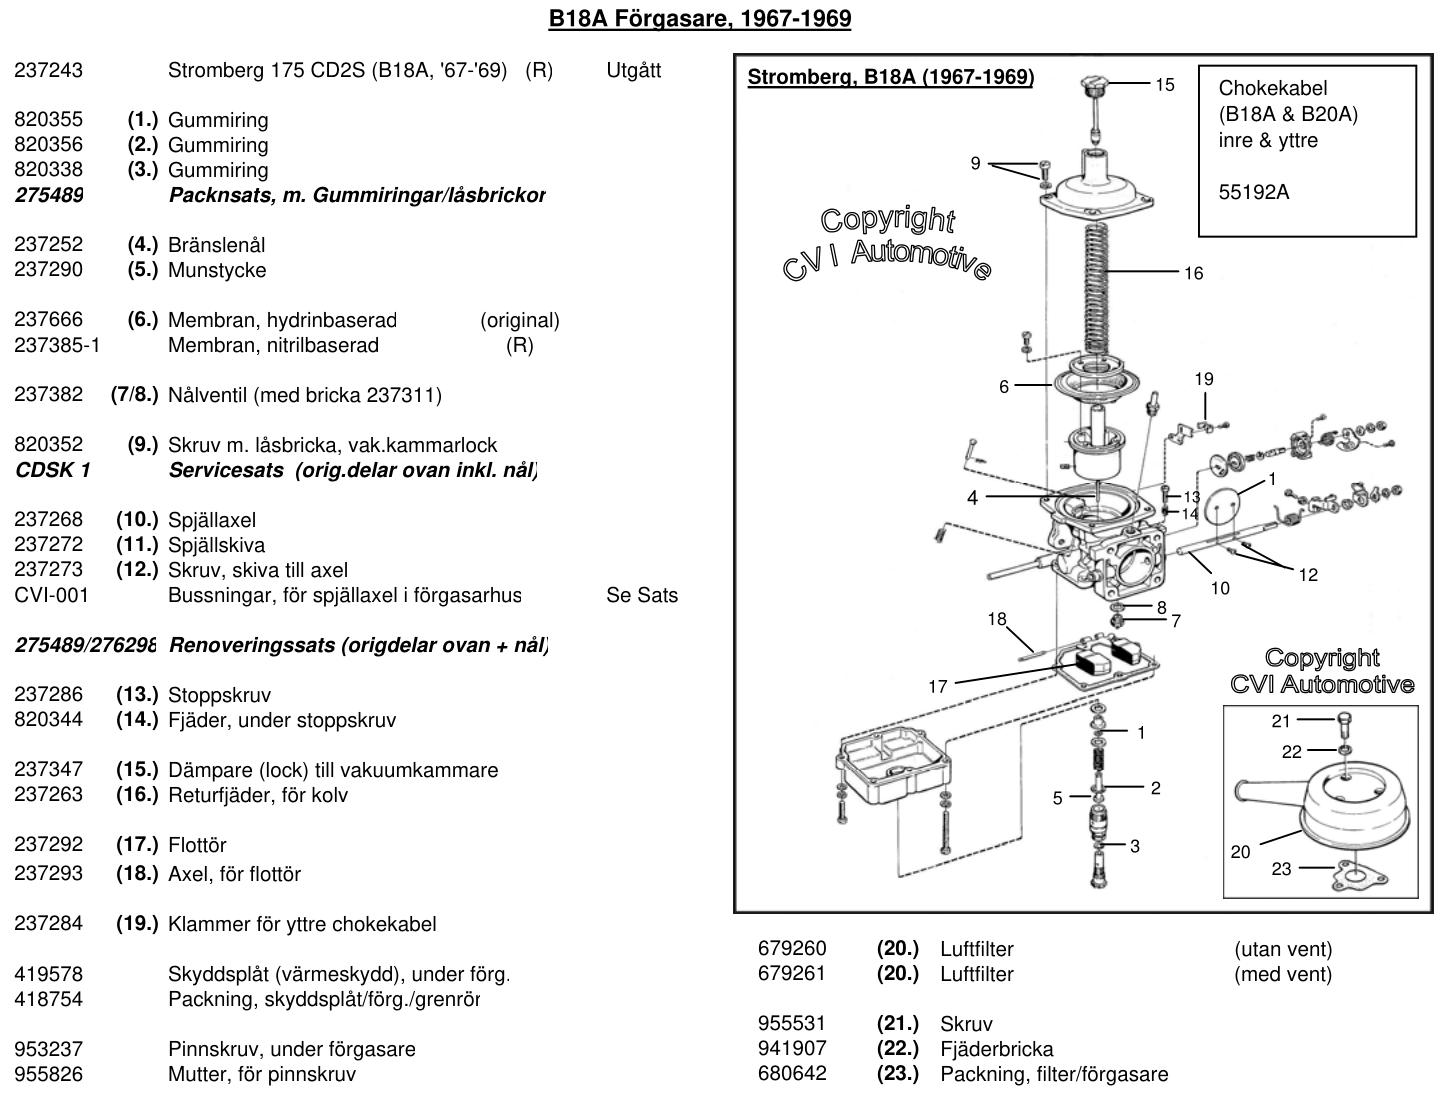 Sprängskiss - Stromberg 175 CD2S